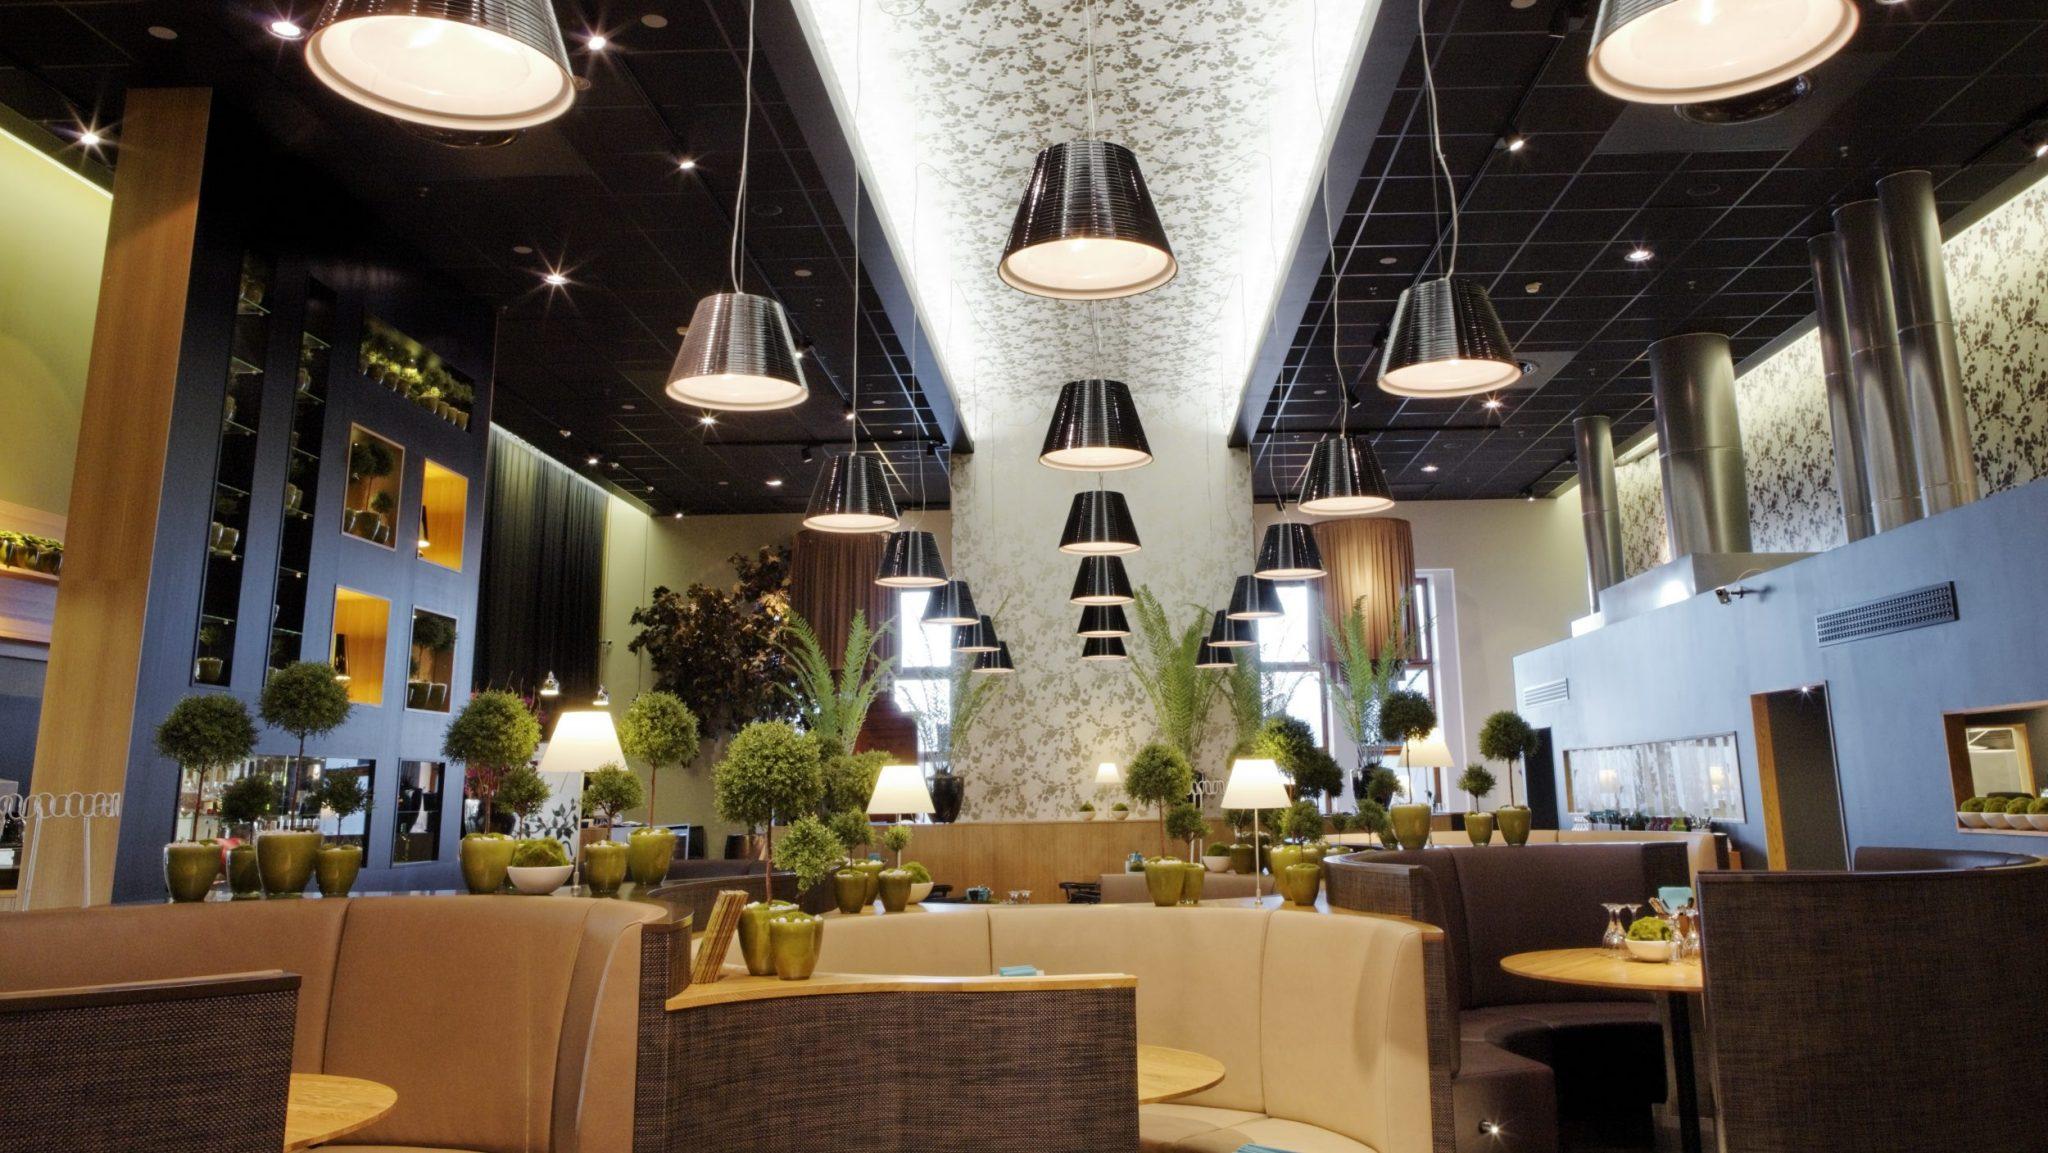 Fazer-Restaurant-F8-Helsinki-GI-Project-9